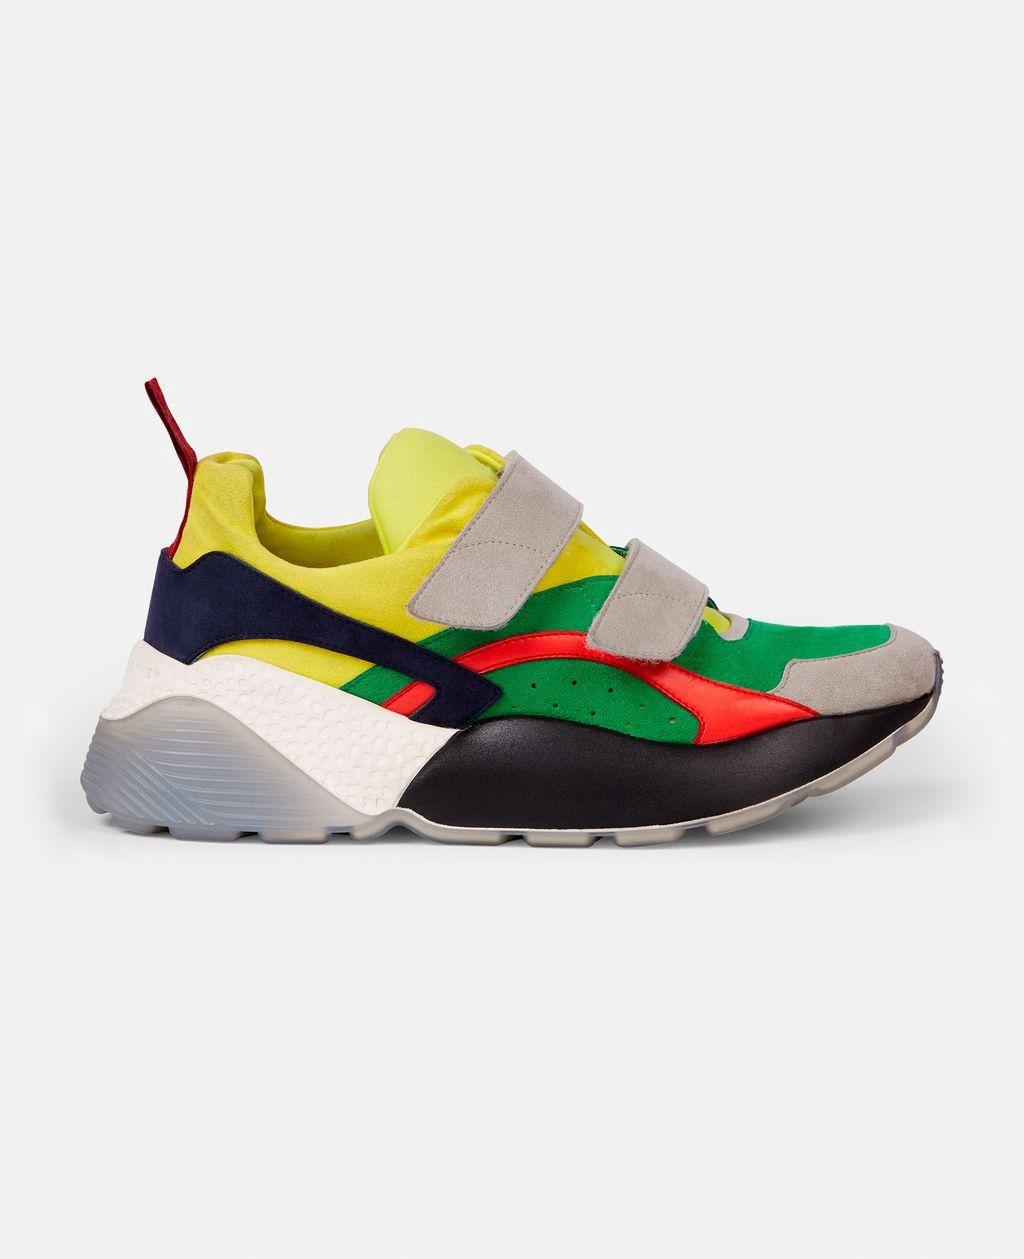 Stella Mccartney Eclypse Colour Block Sneakers - 11  3bb4c779beb30